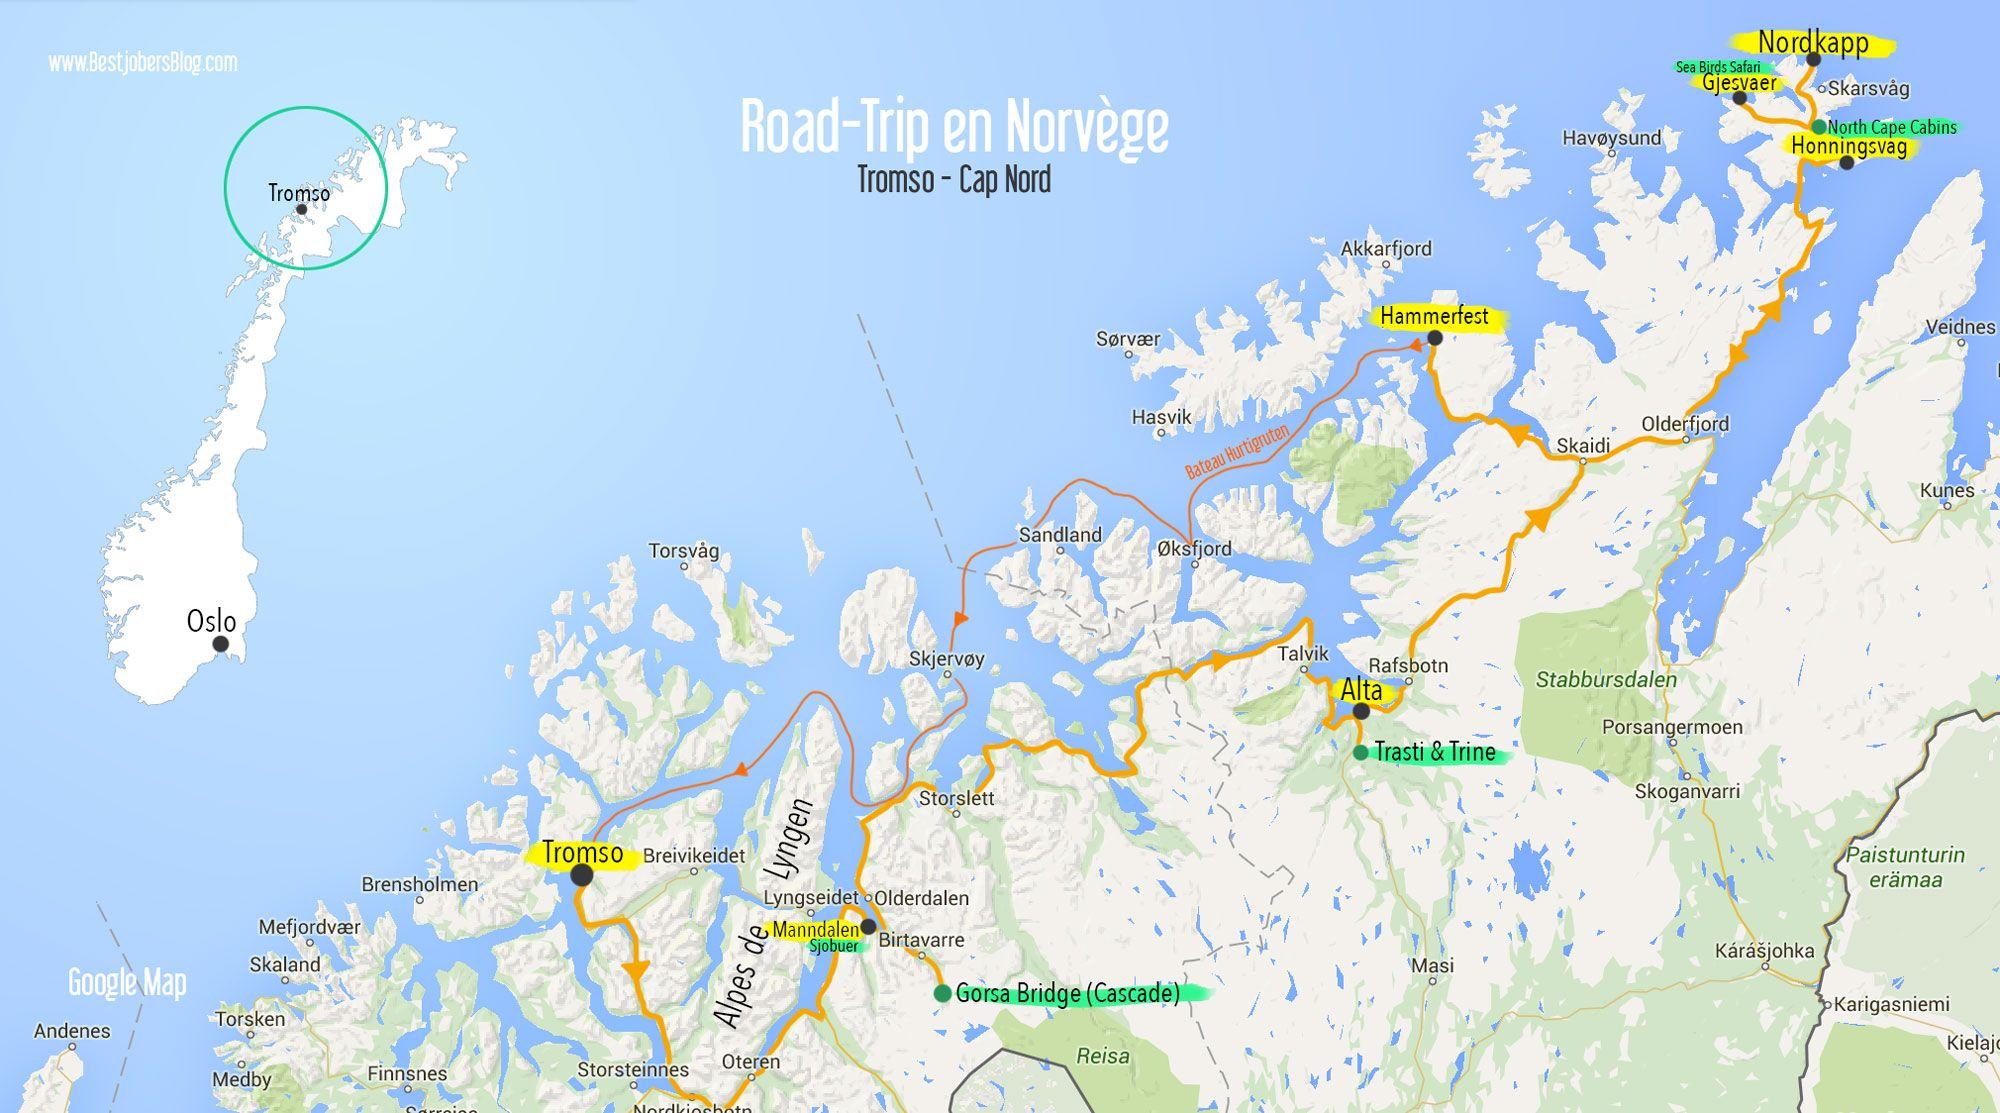 Carte Norvege Cap Nord.Itineraire Road Trip Norvege Carte Tromso Cap Nord Norvege